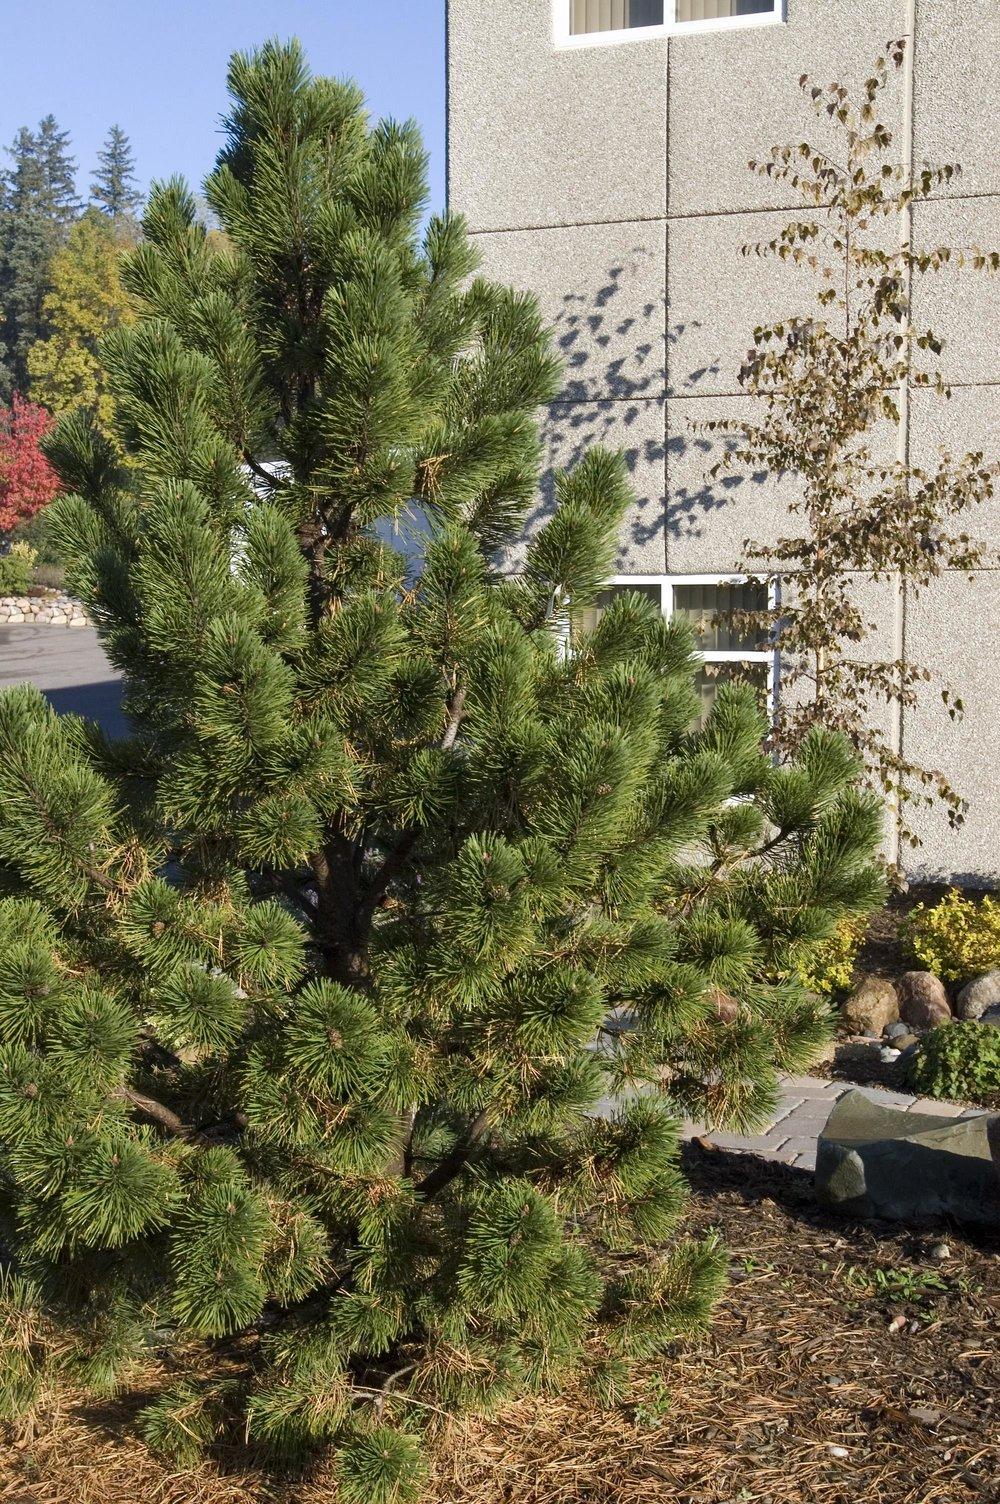 5273-2_PinusmugoTannenbaumPine.jpg.jpg